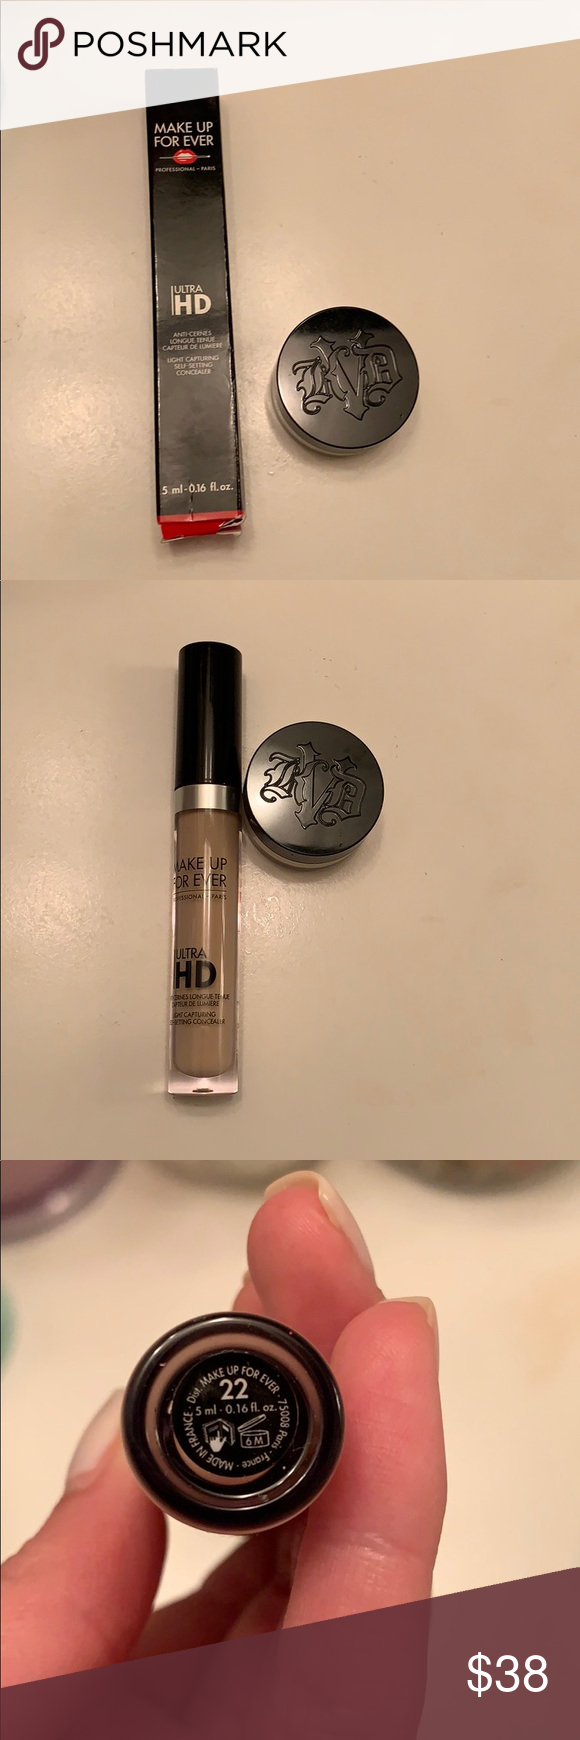 Makeup forever Ultra Hd concealer shade 22 in 2020